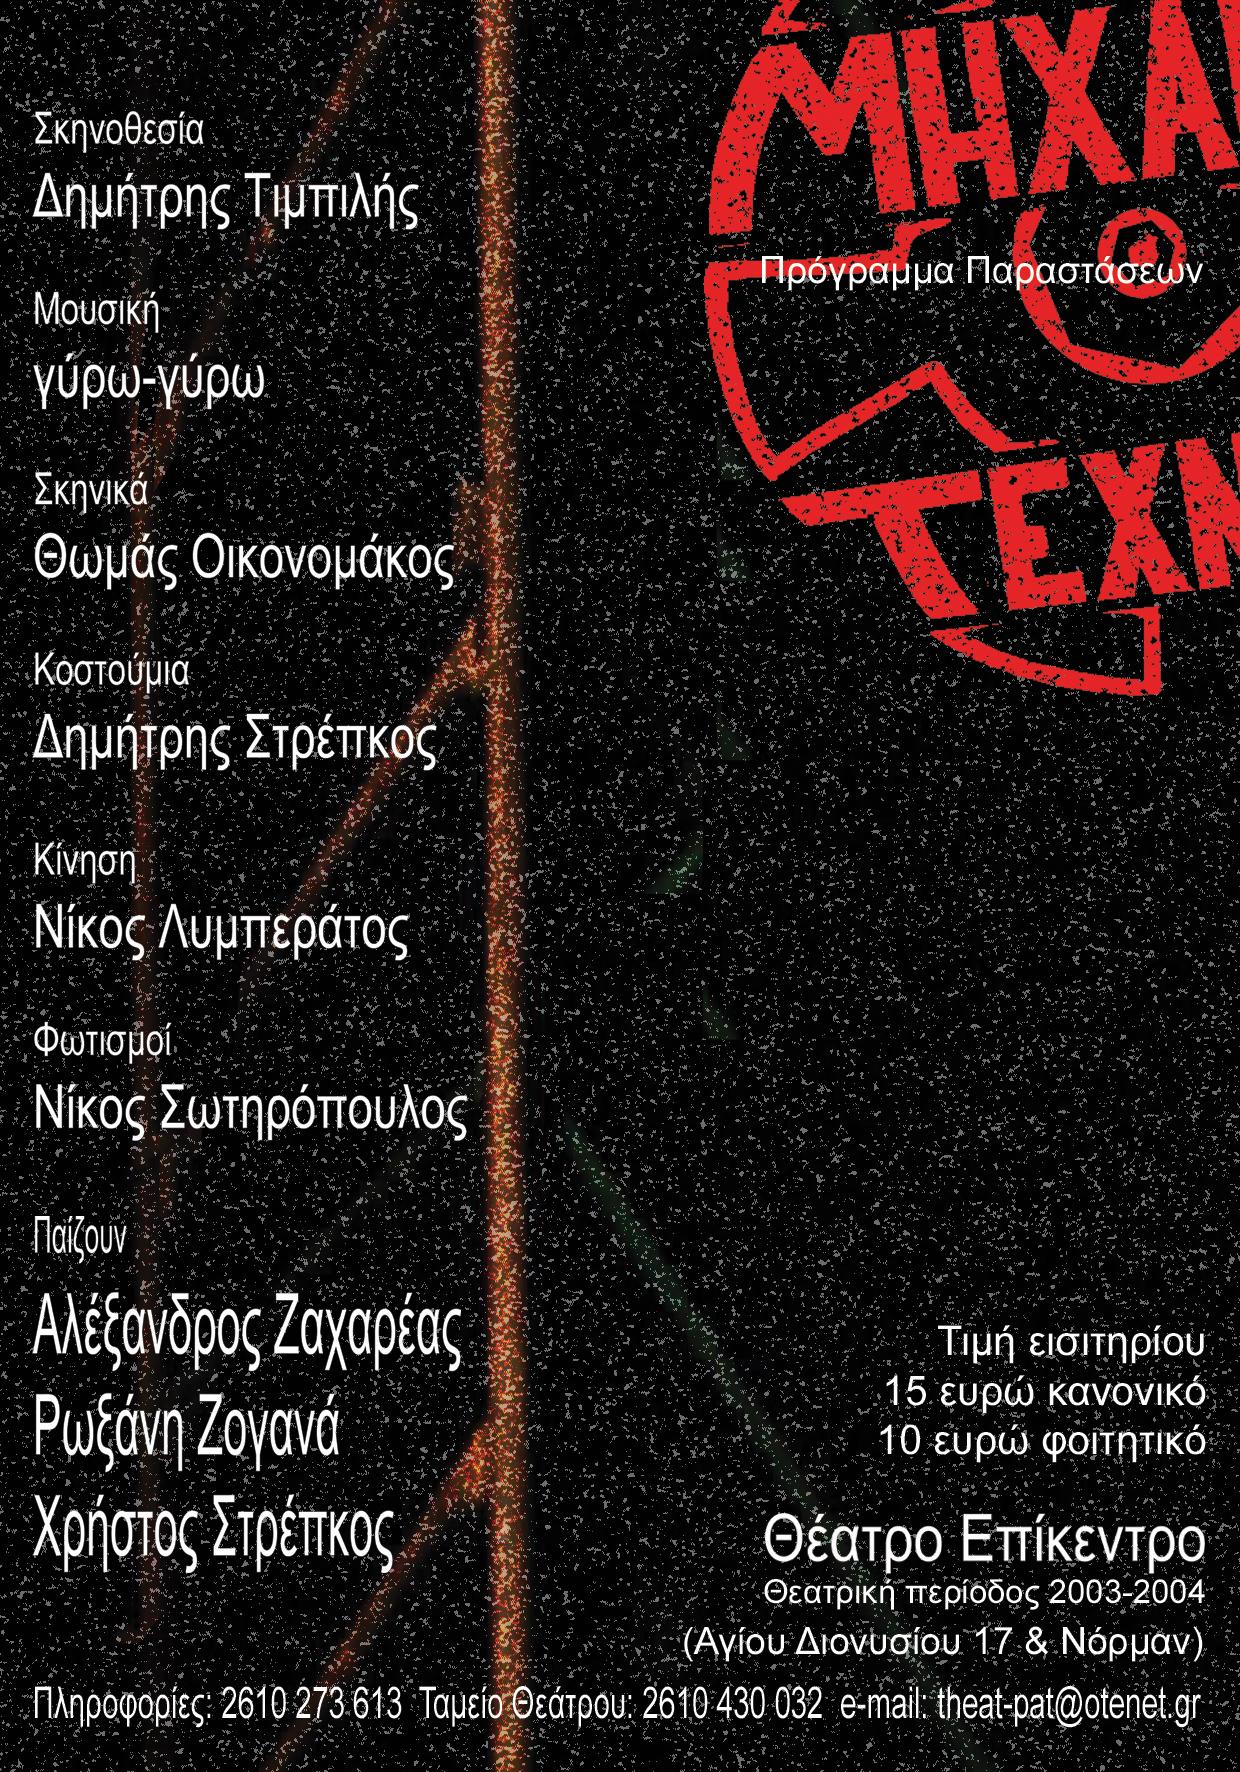 2004 I Want You Speedy by Christos Strepkos Flyer Back.jpg